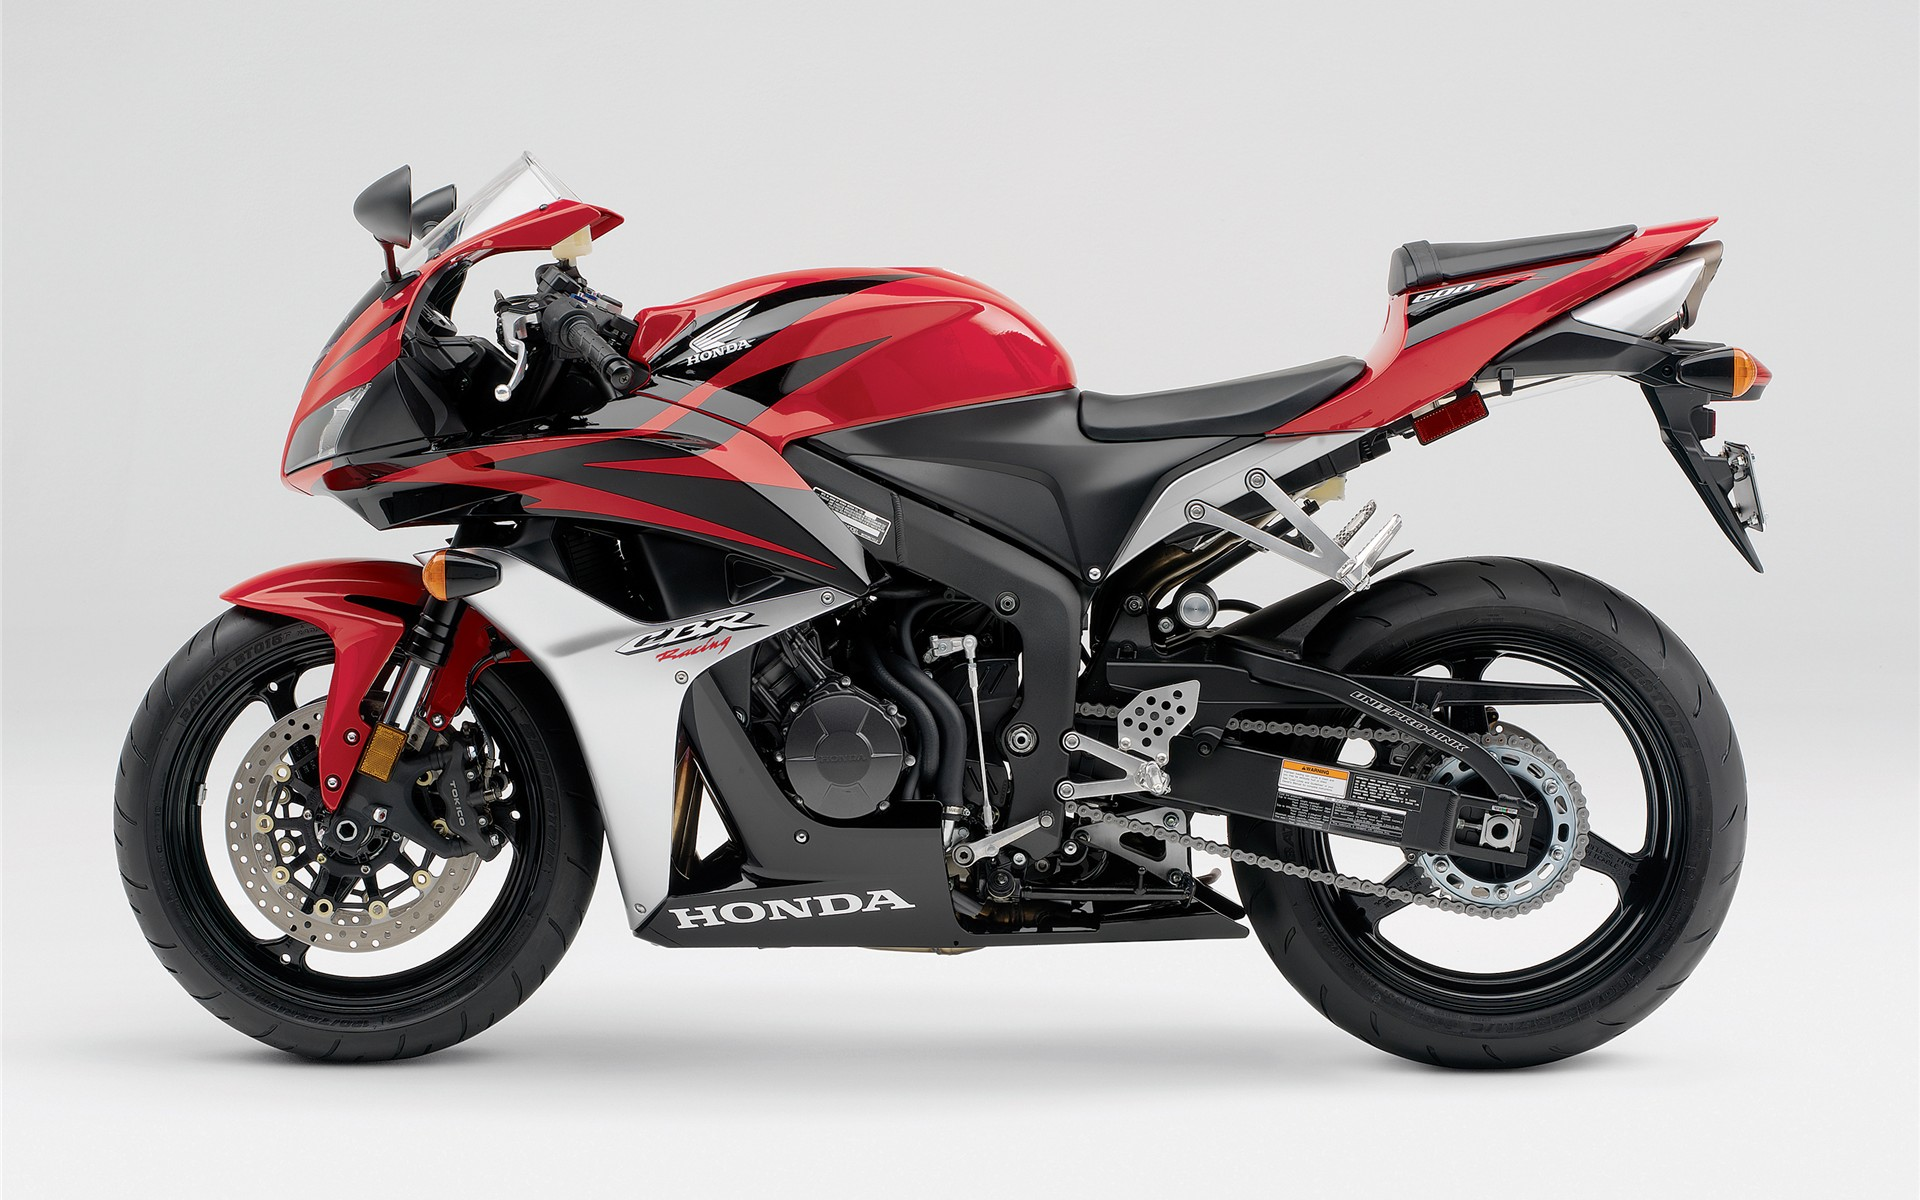 Honda Motorcycle Cbrrr Sportbike Free 427734 Wallpaper wallpaper